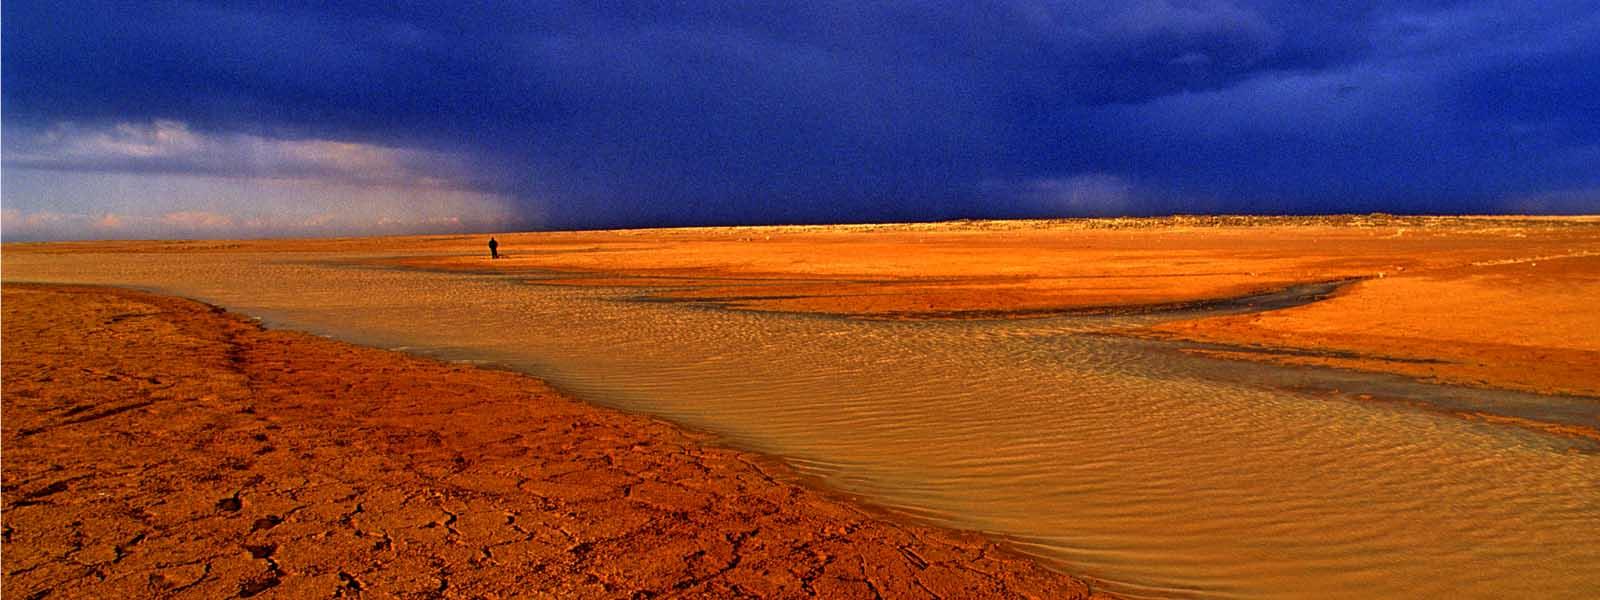 W5625B-Dramatic-Jordan-desert-scene-stretch